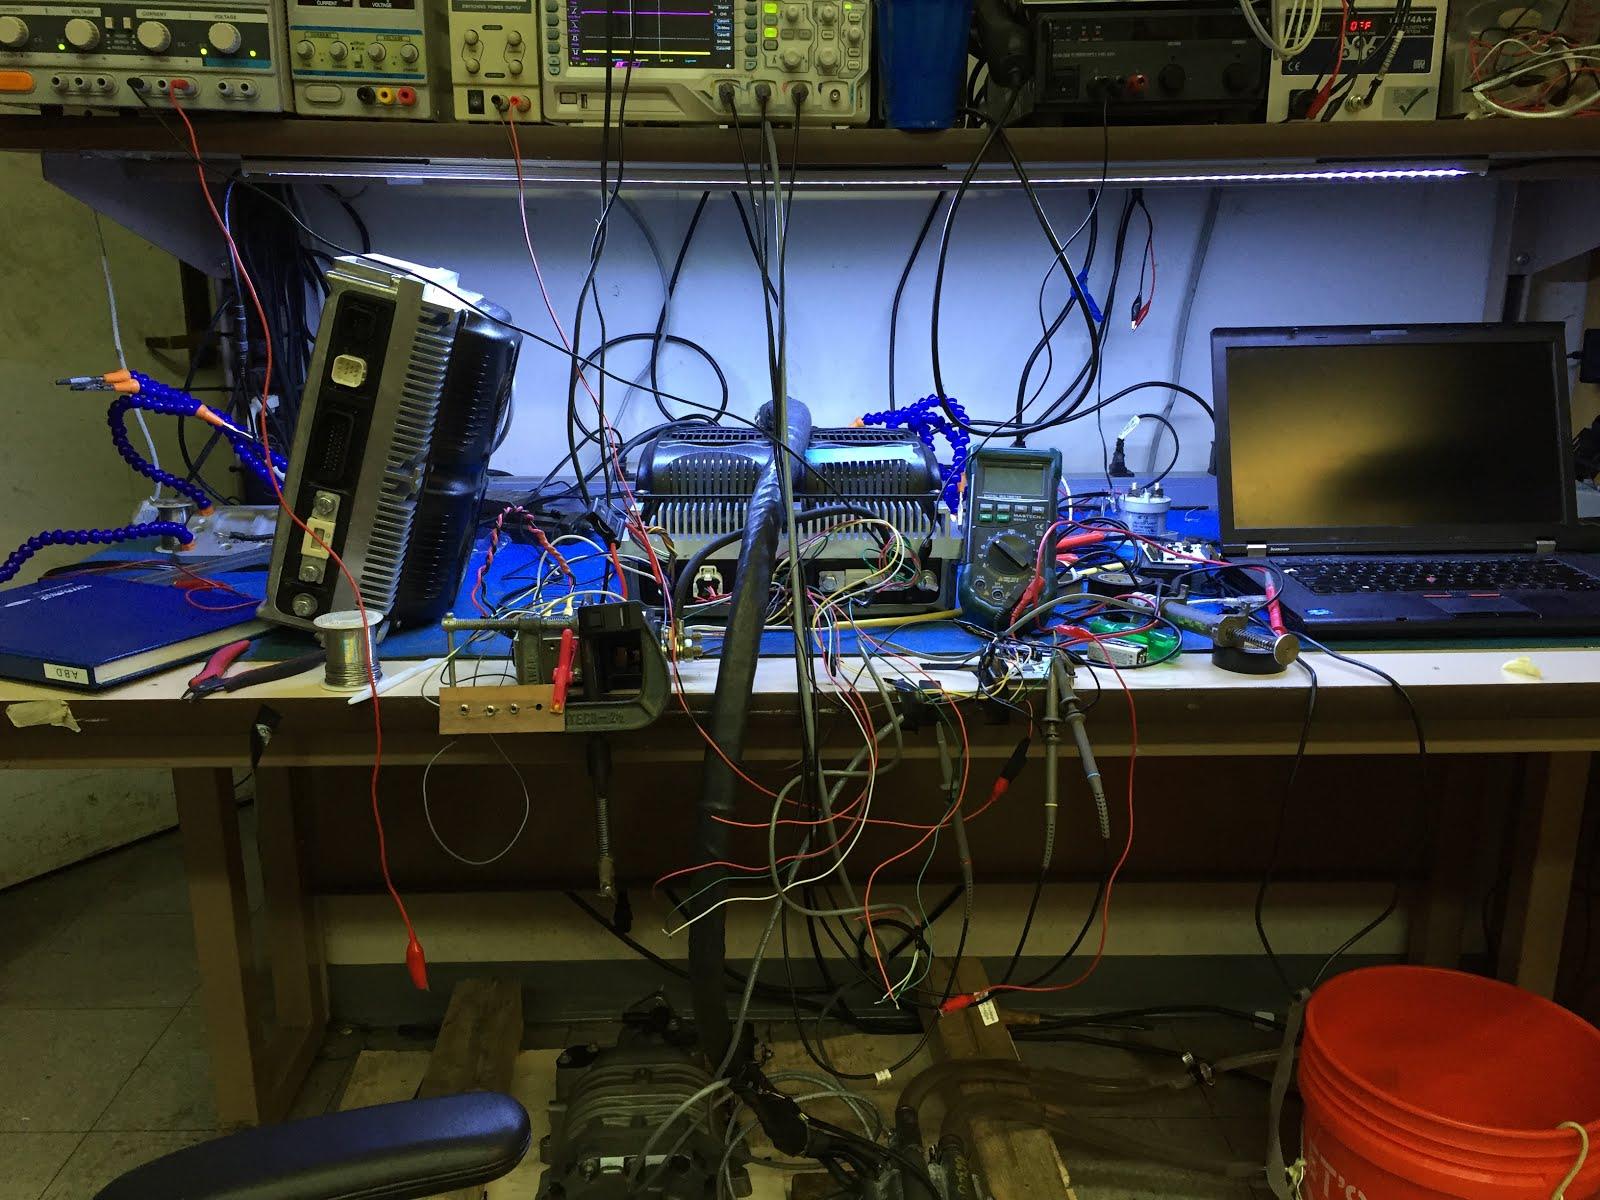 The Cactus Zone: Electric Boat using a SEVCON espAC motor controller